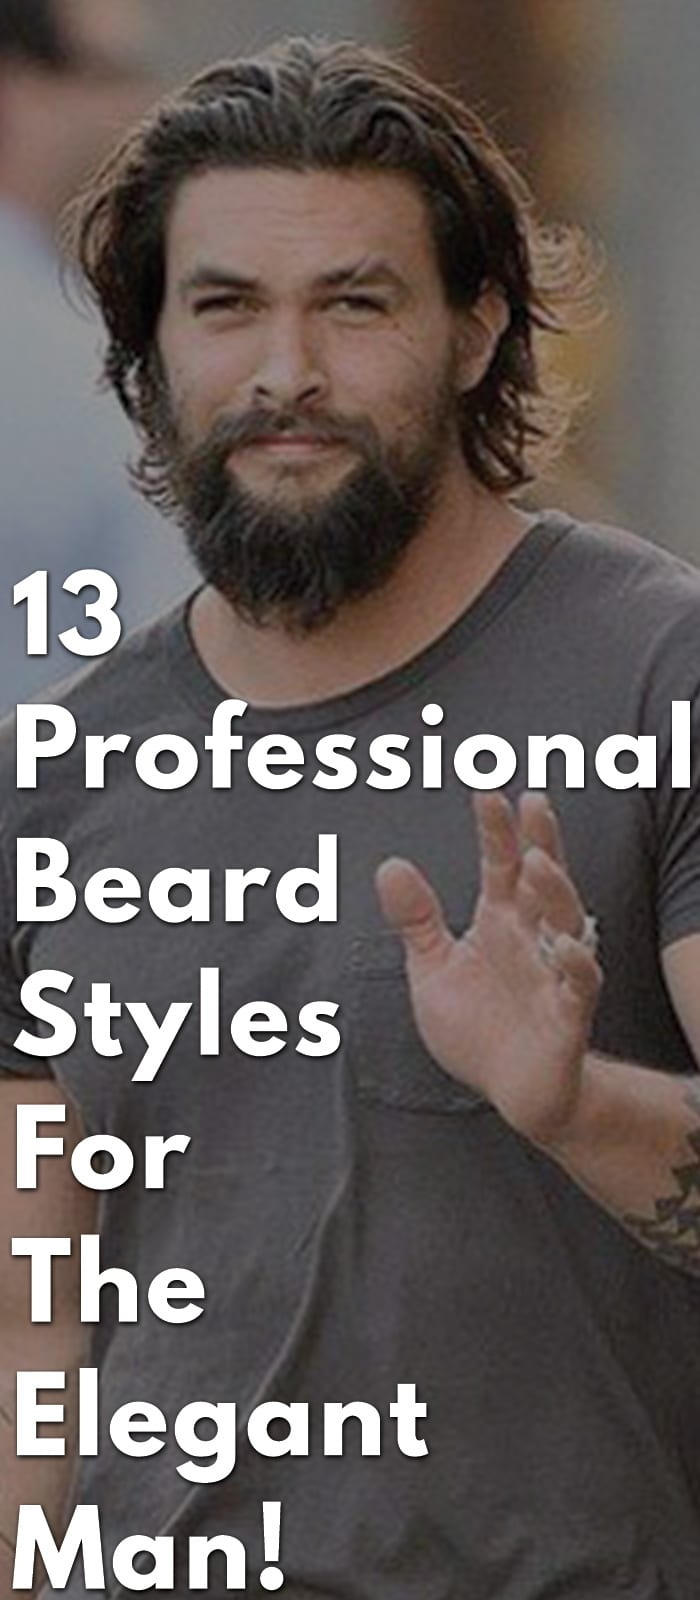 13-Professional-Beard-Styles-For-The-Elegant-Man!.